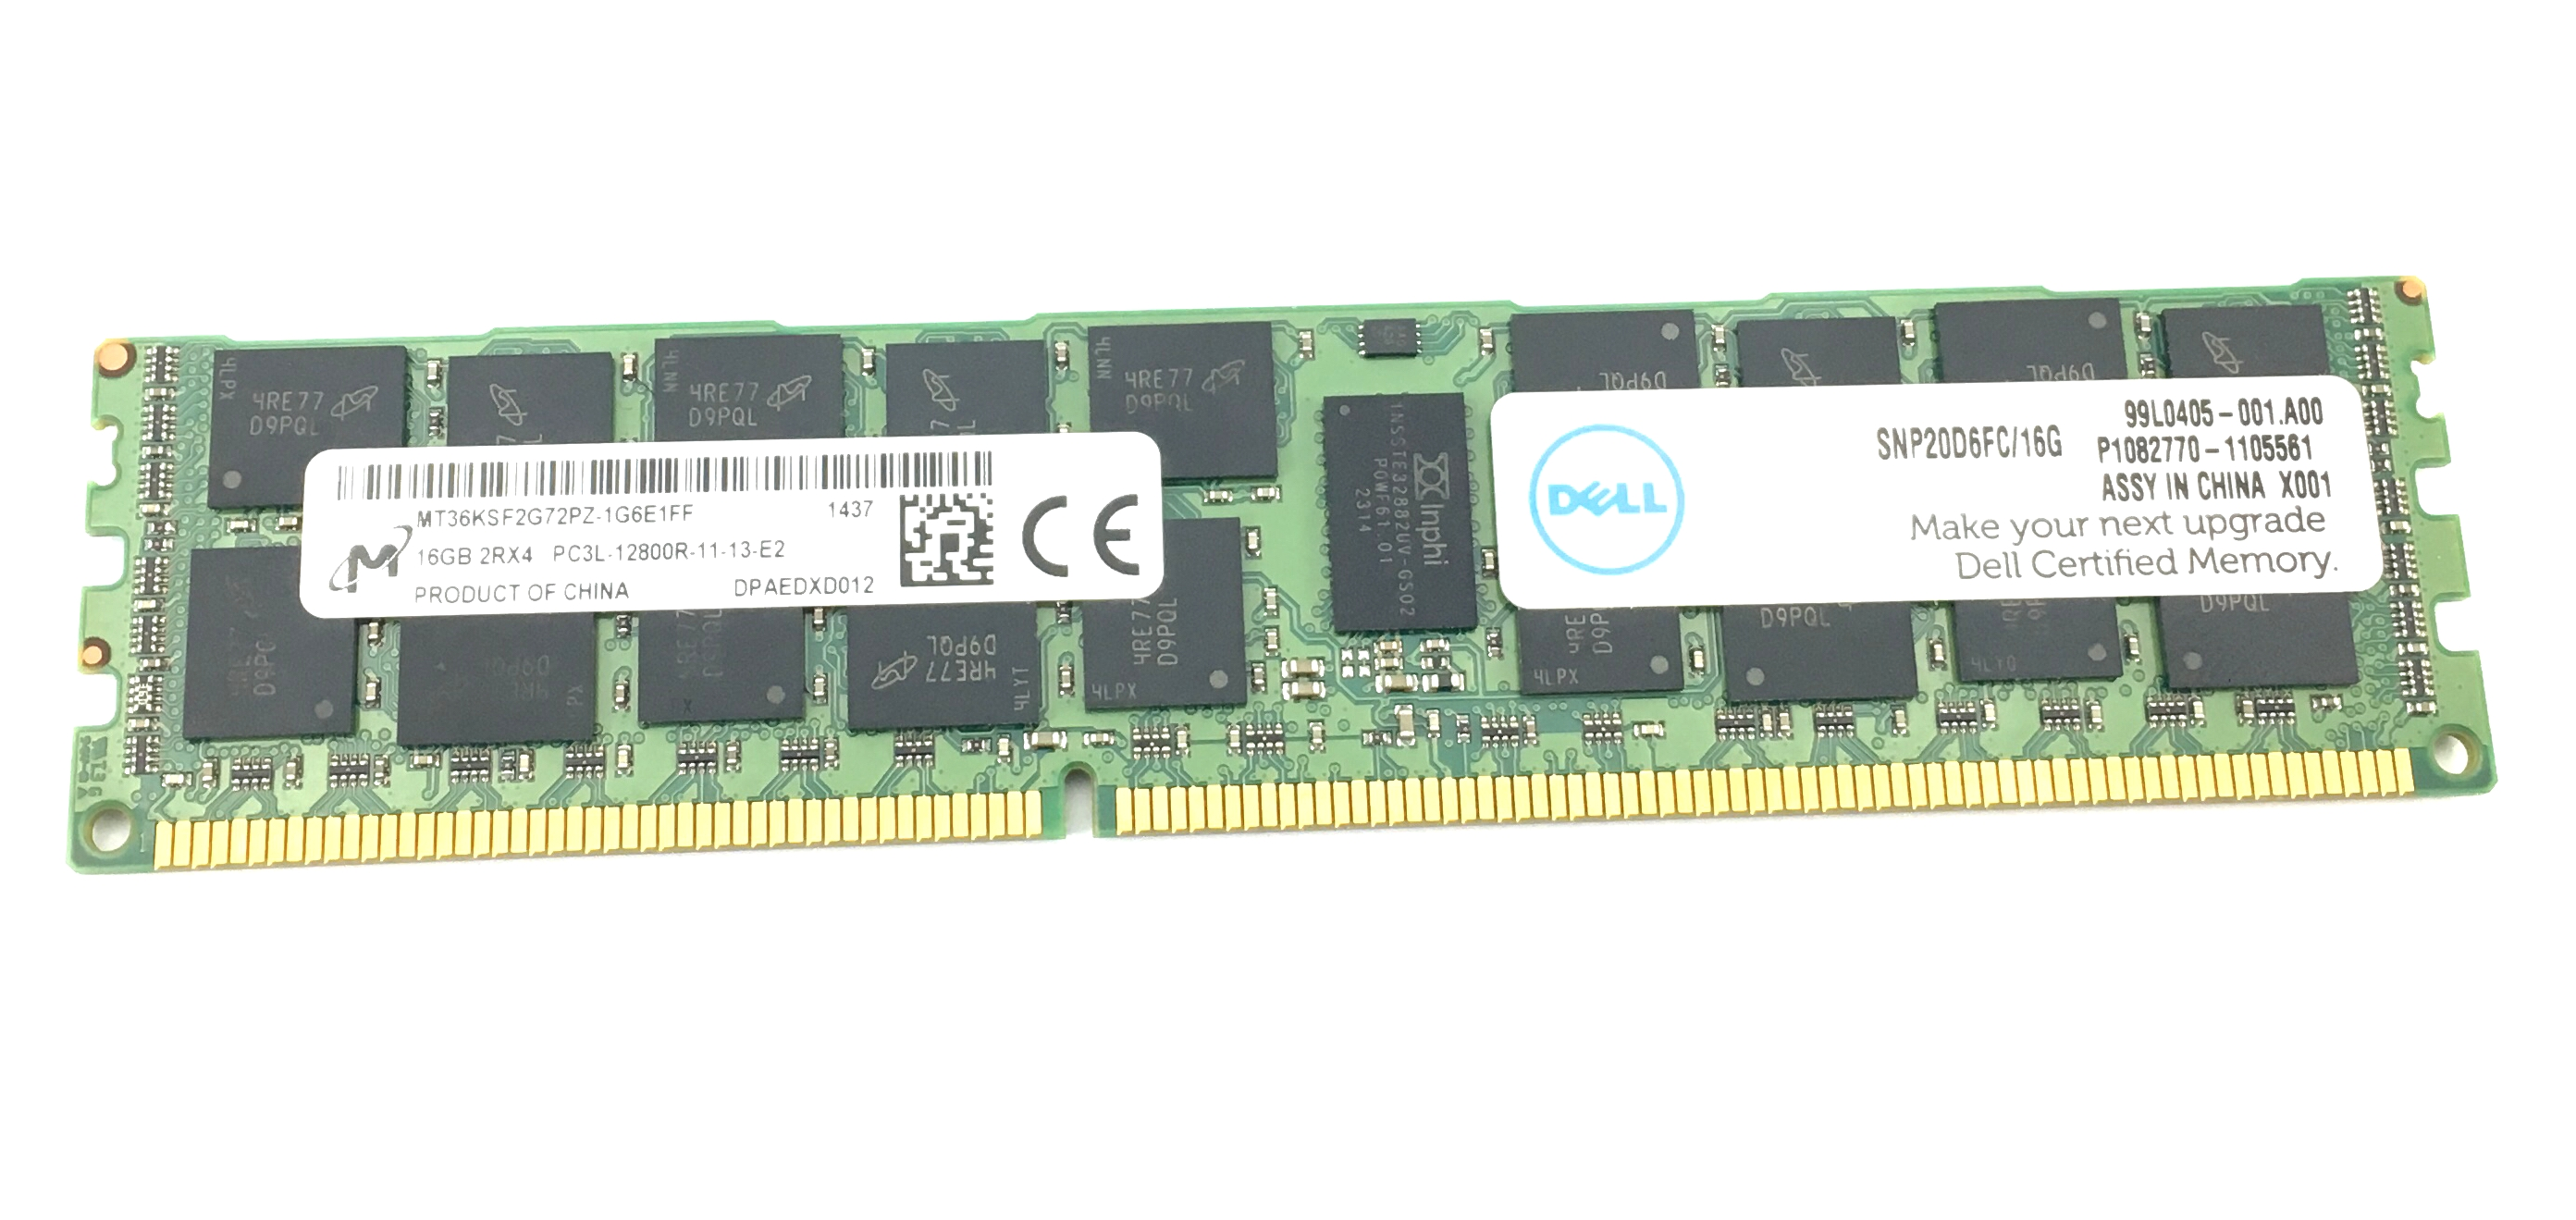 Dell 16GB 2Rx4 PC3L 12800R DDR3 1600MHz ECC REG Memory (SNP20D6FC/16G)